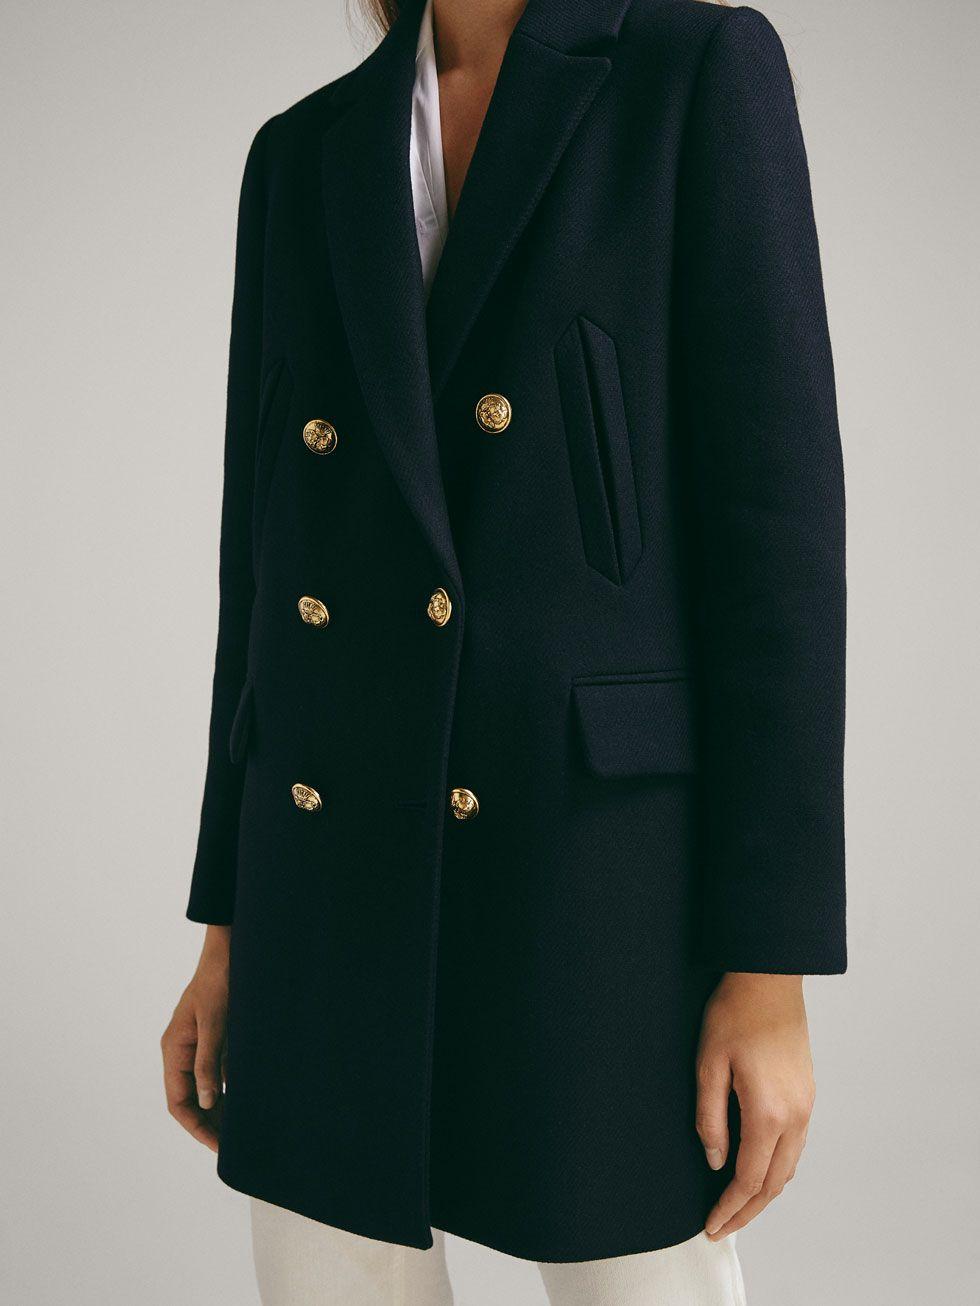 Outerwear Up To 30 Off New In Women Massimo Dutti Coats Jackets Women Wool Coat Women Jackets For Women